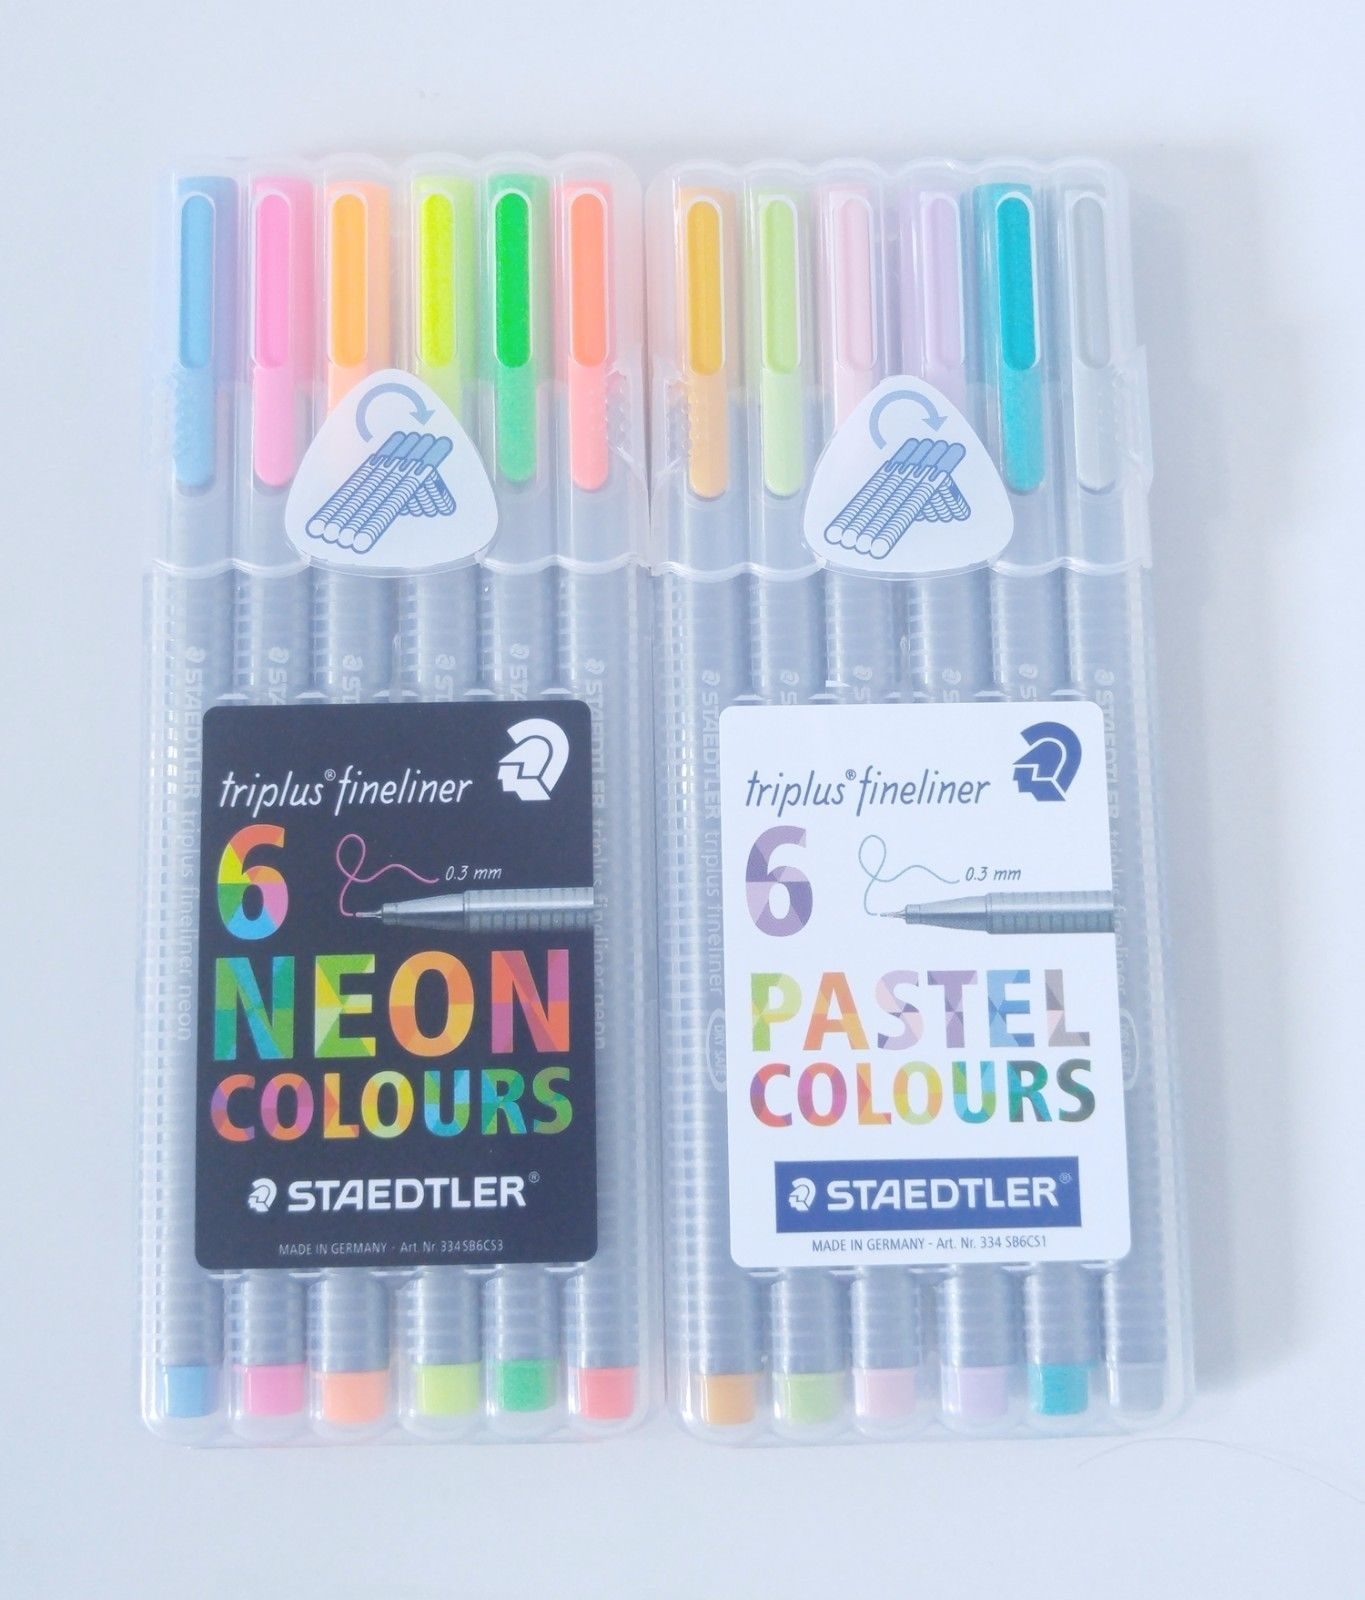 Staedtler 20 Pack Pens My Style T Bullet Planners And Triplus Color Fibre Tip Pen 323 34 Aqua Blue Fineliner 03mm 6 Assorted Pastel Neon Colors 2 Set